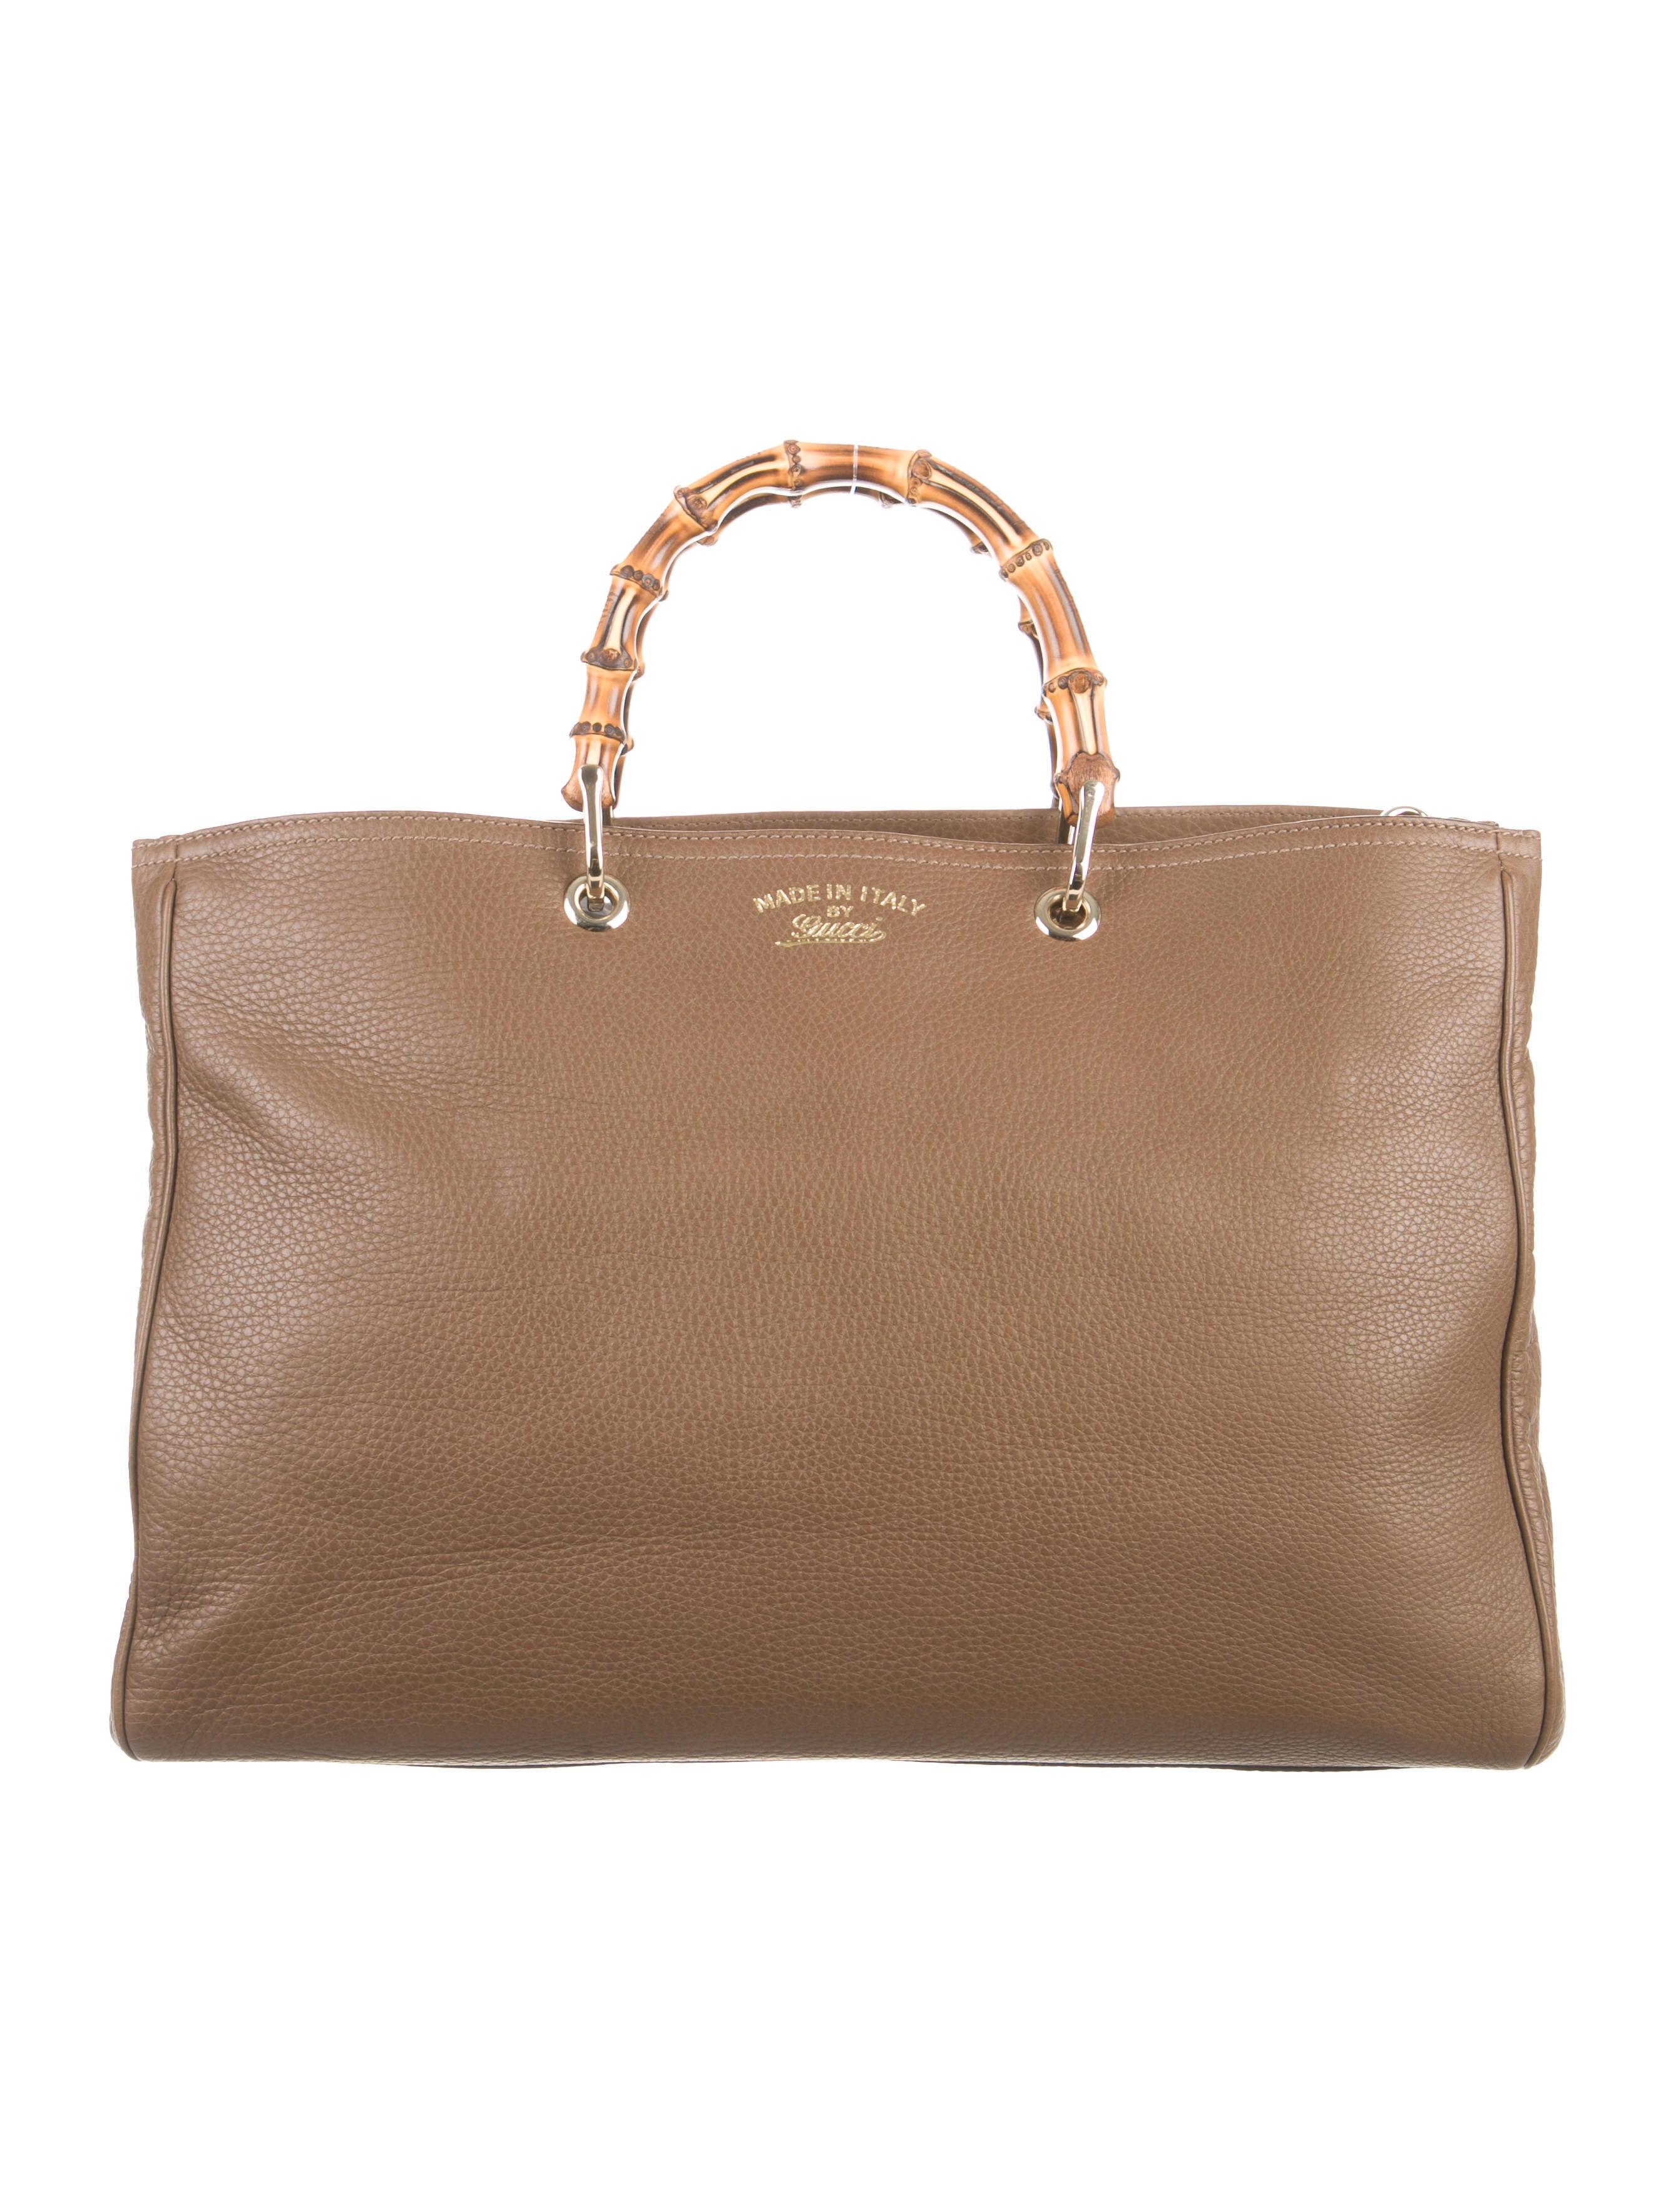 gucci large bamboo shopper tote handbags guc106710 the realreal. Black Bedroom Furniture Sets. Home Design Ideas